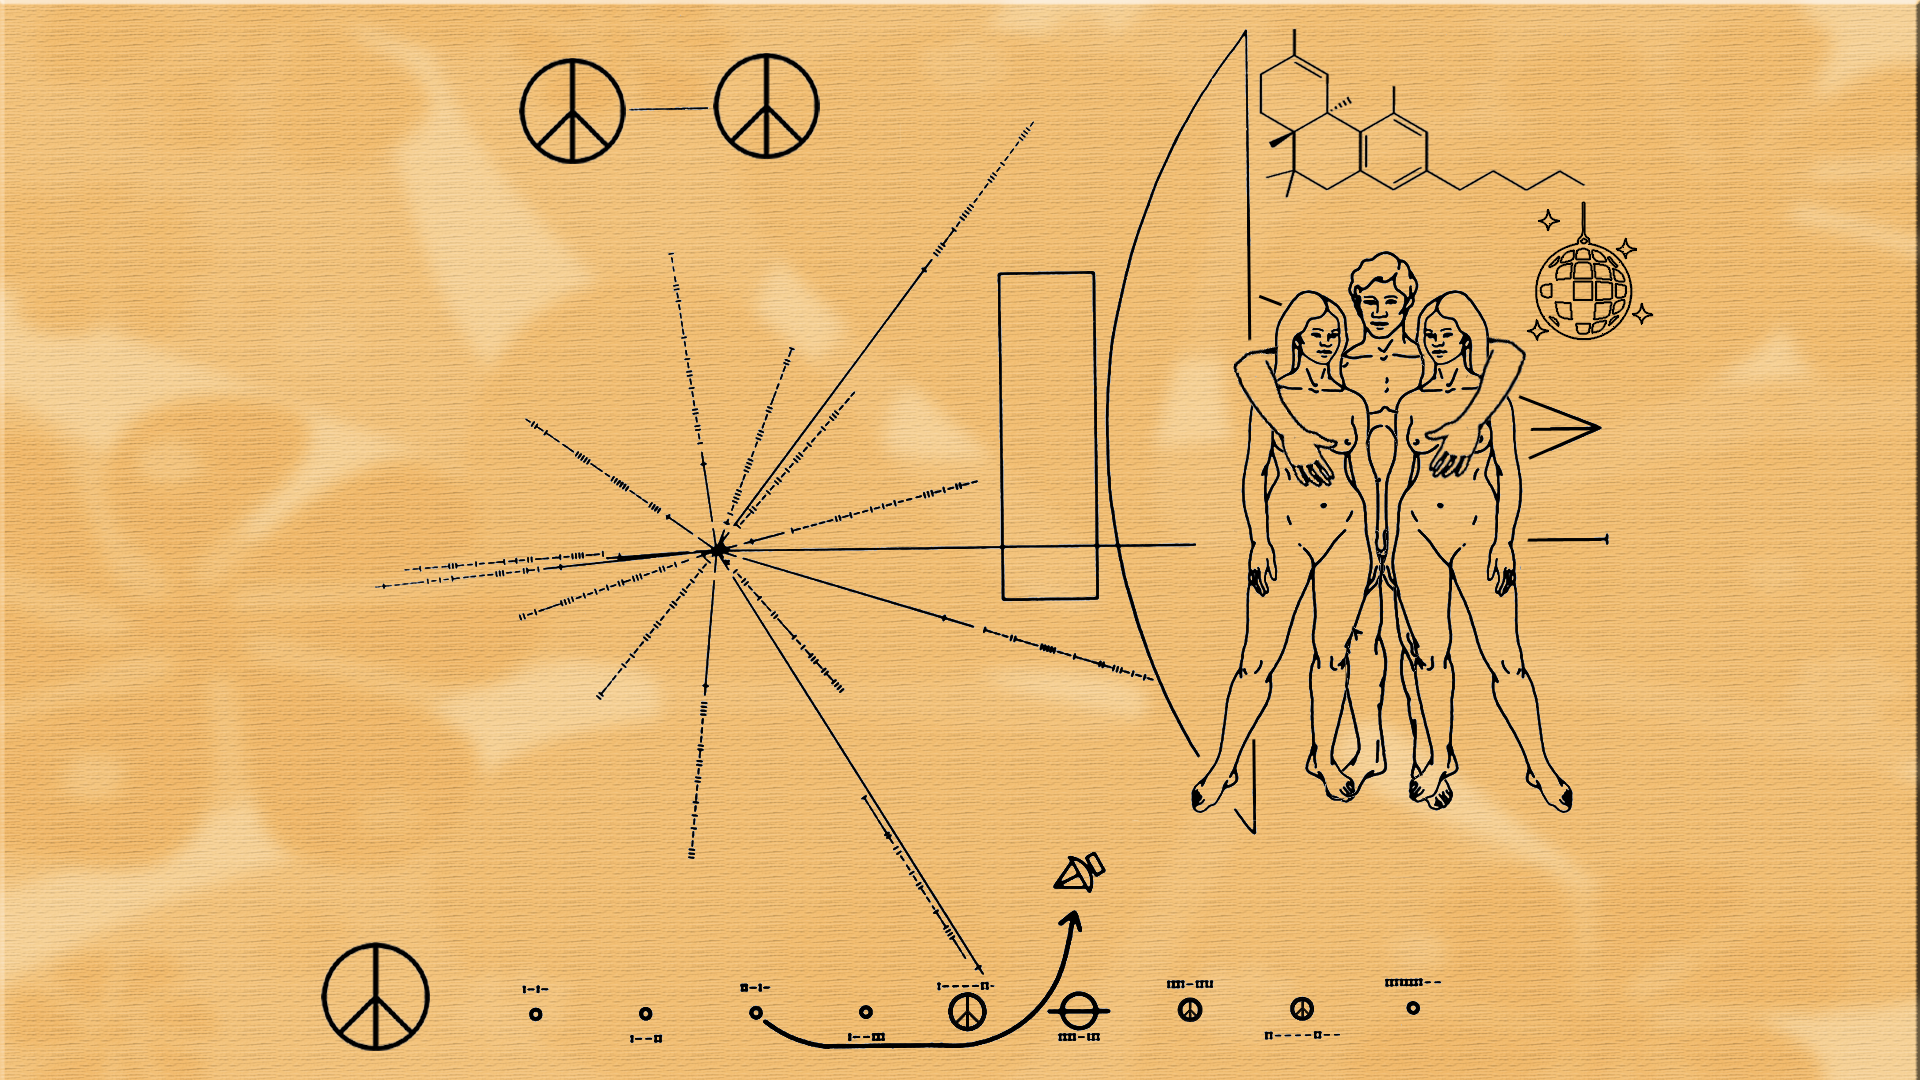 ExoConference - Pioneer 10 Plaque #8